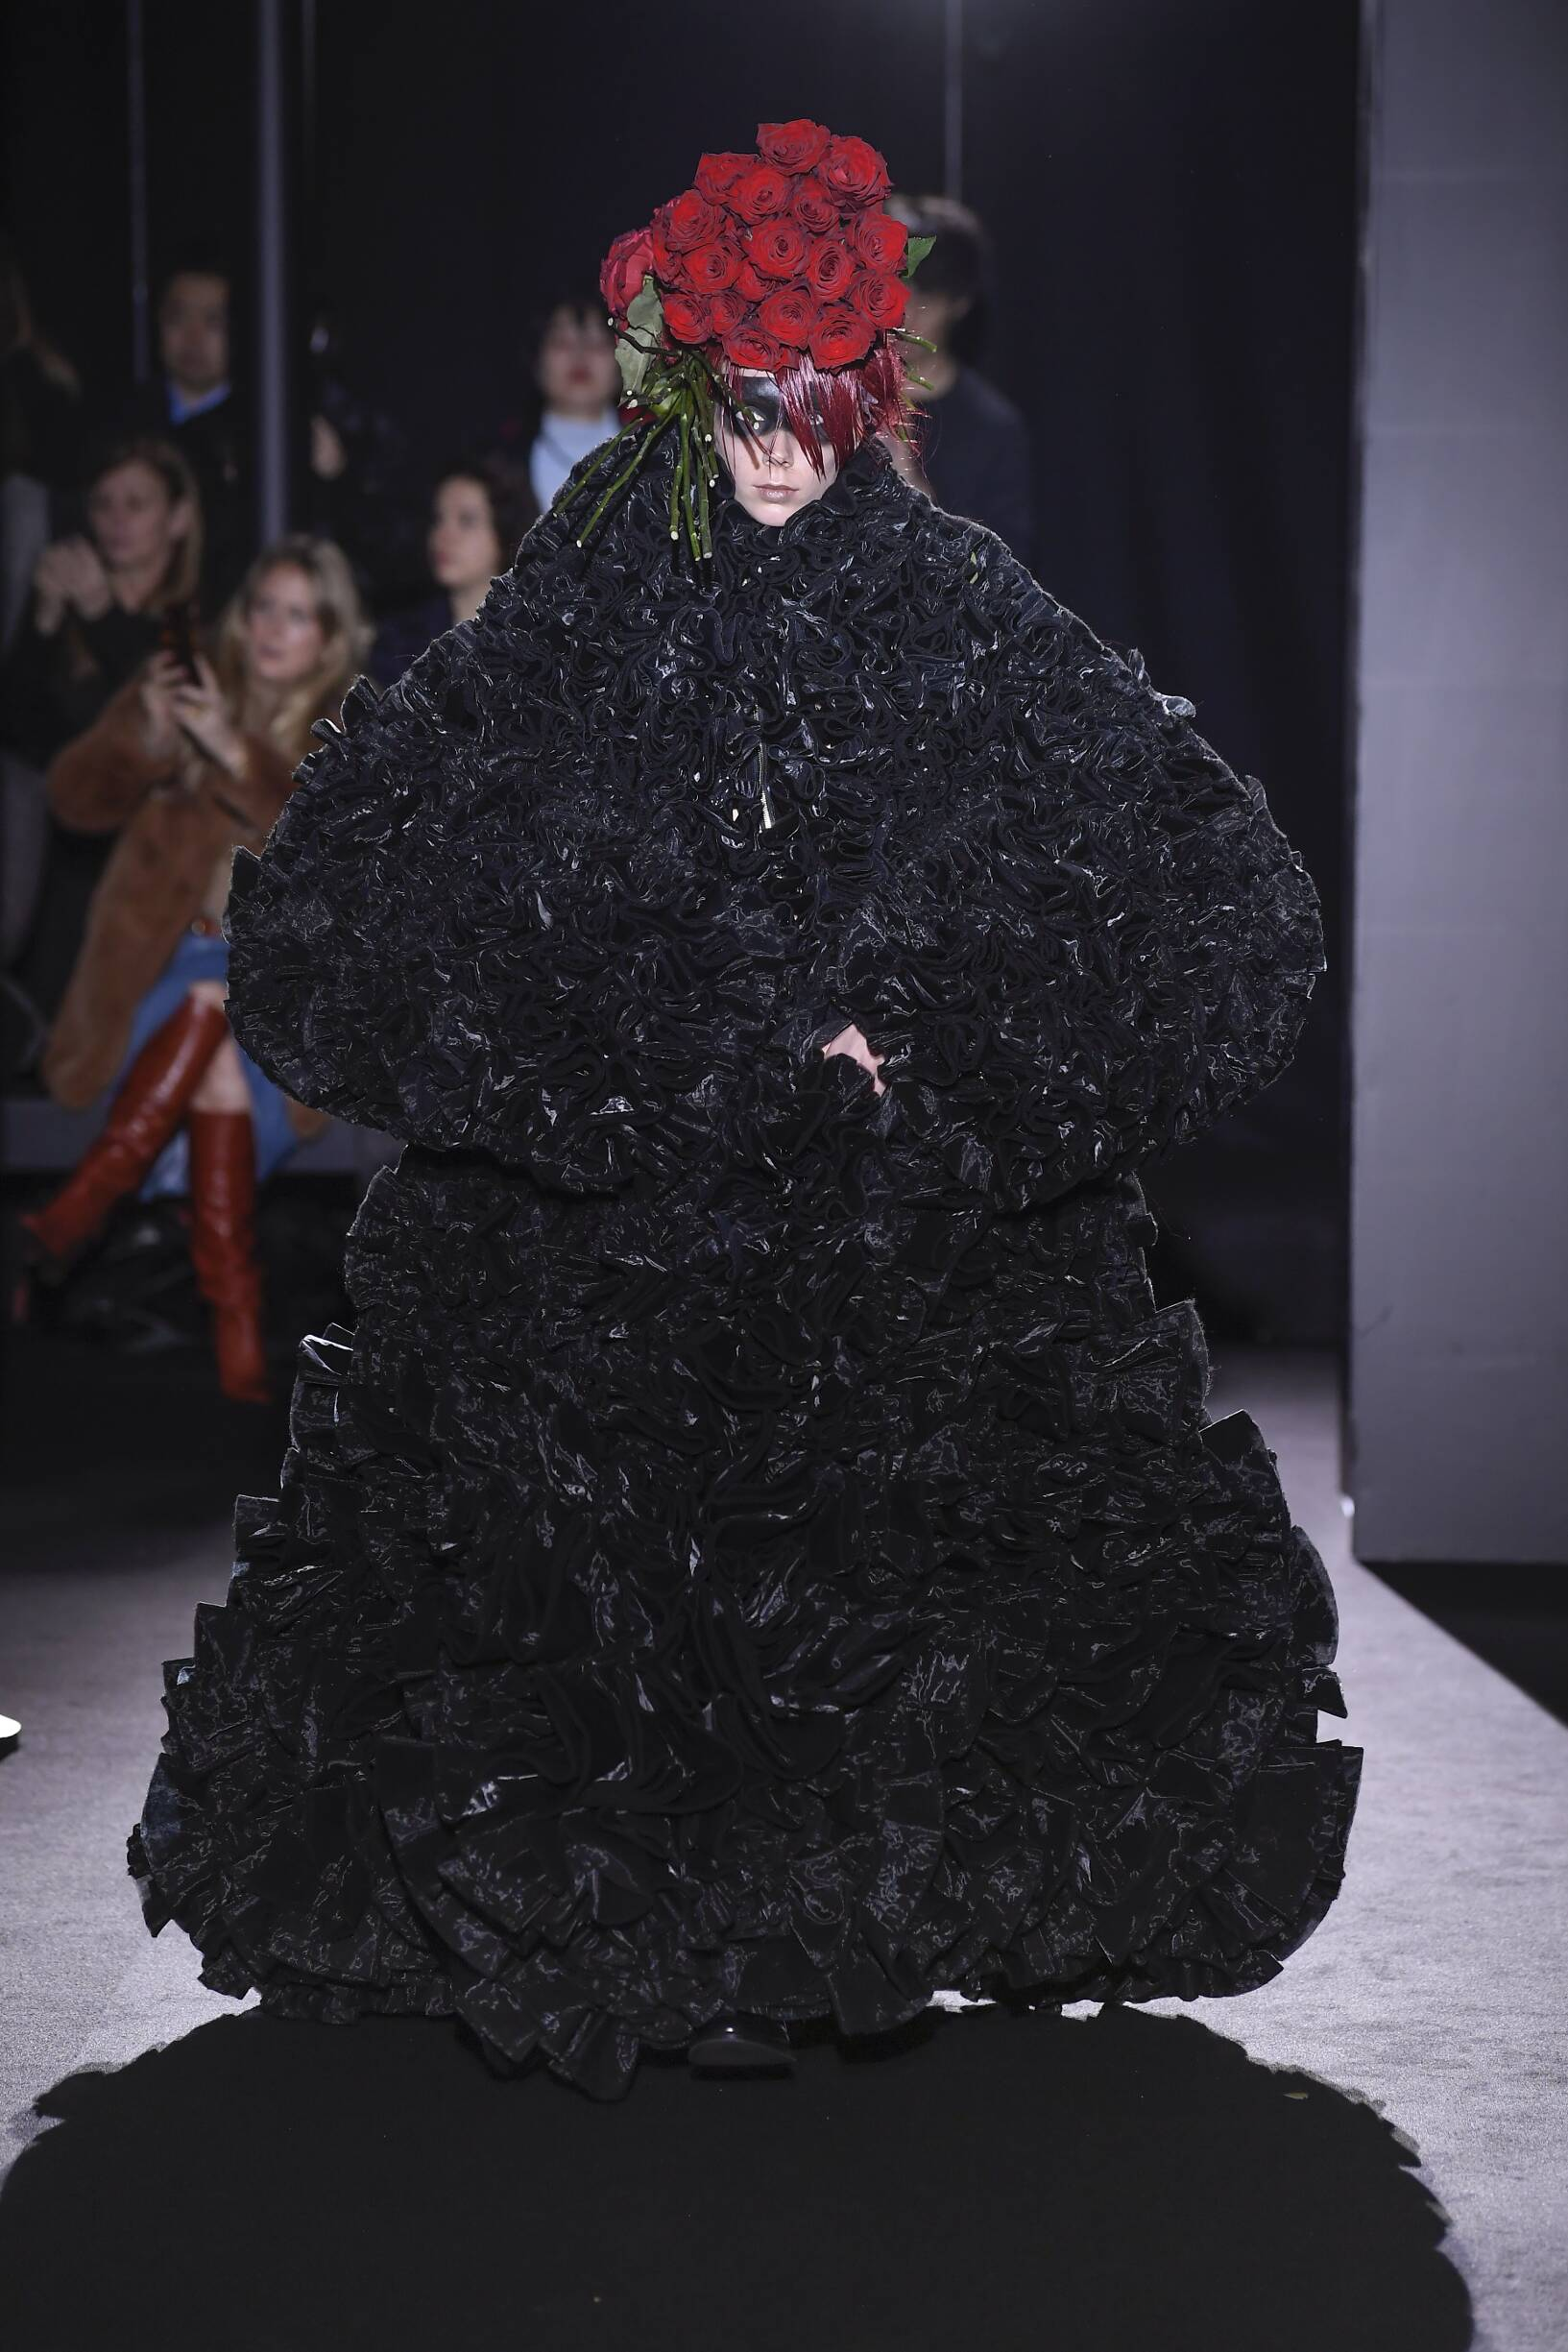 Catwalk Noir Kei Ninomiya Woman Fashion Show Winter 2019